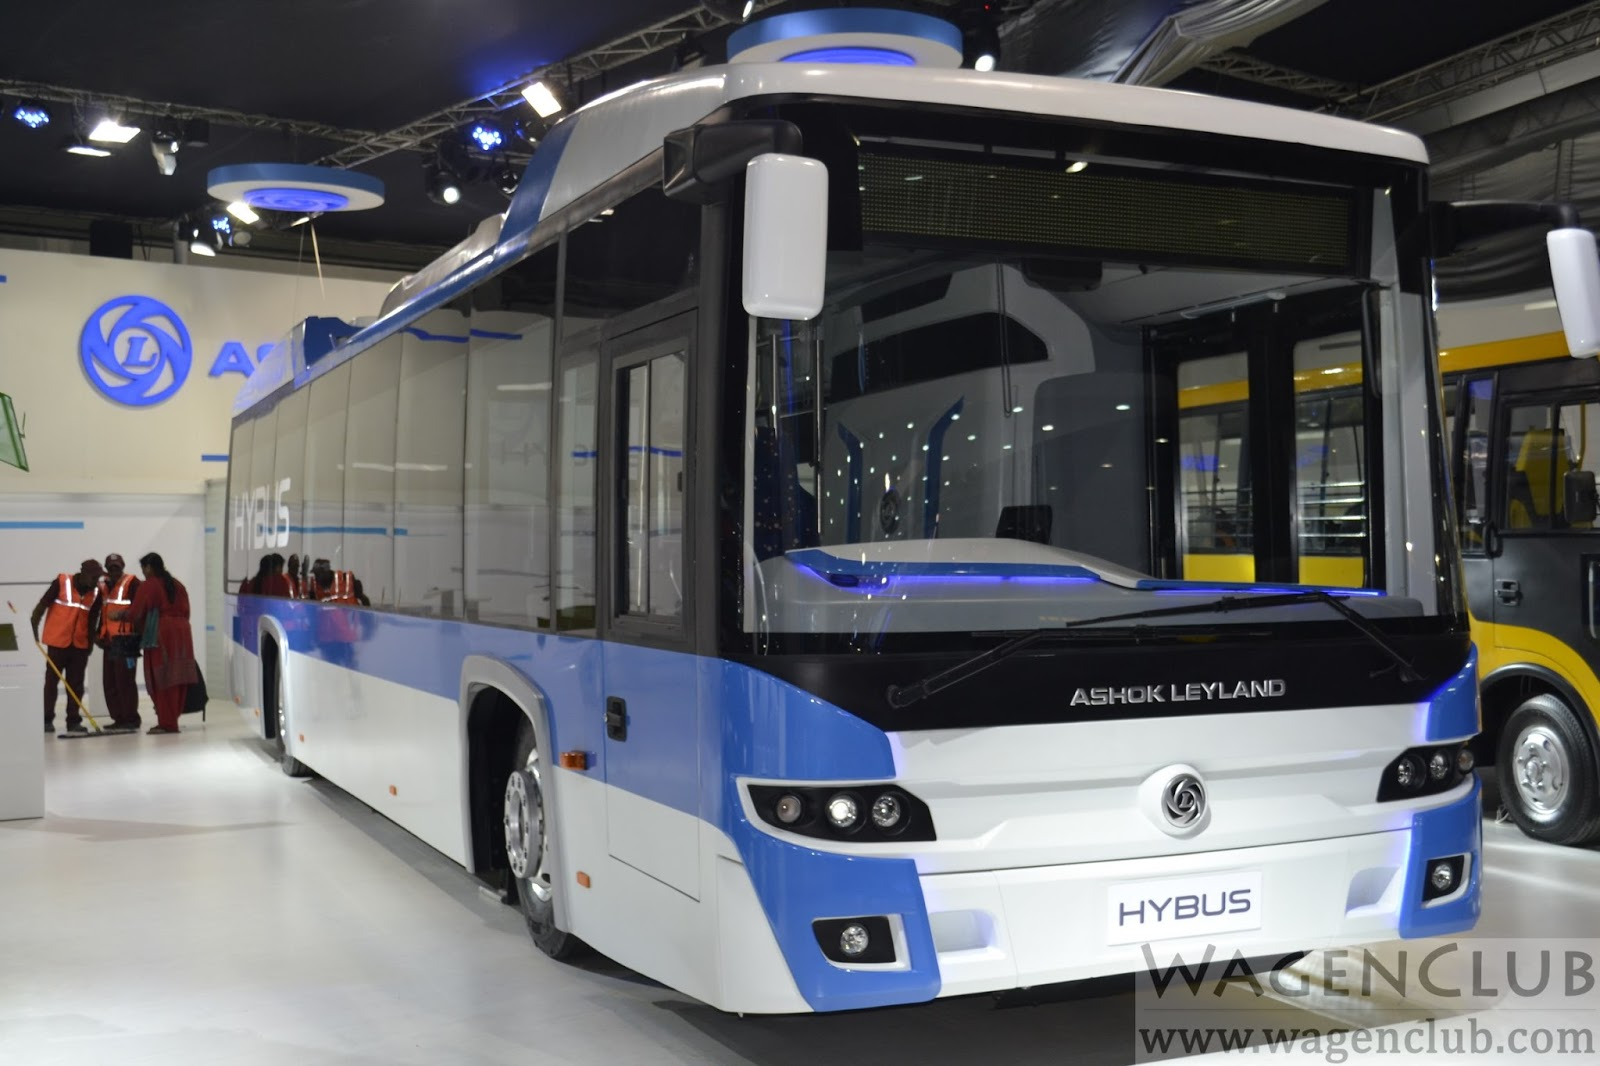 ashok leyland hybus hybrid bus 2016 auto expo wagenclub. Black Bedroom Furniture Sets. Home Design Ideas